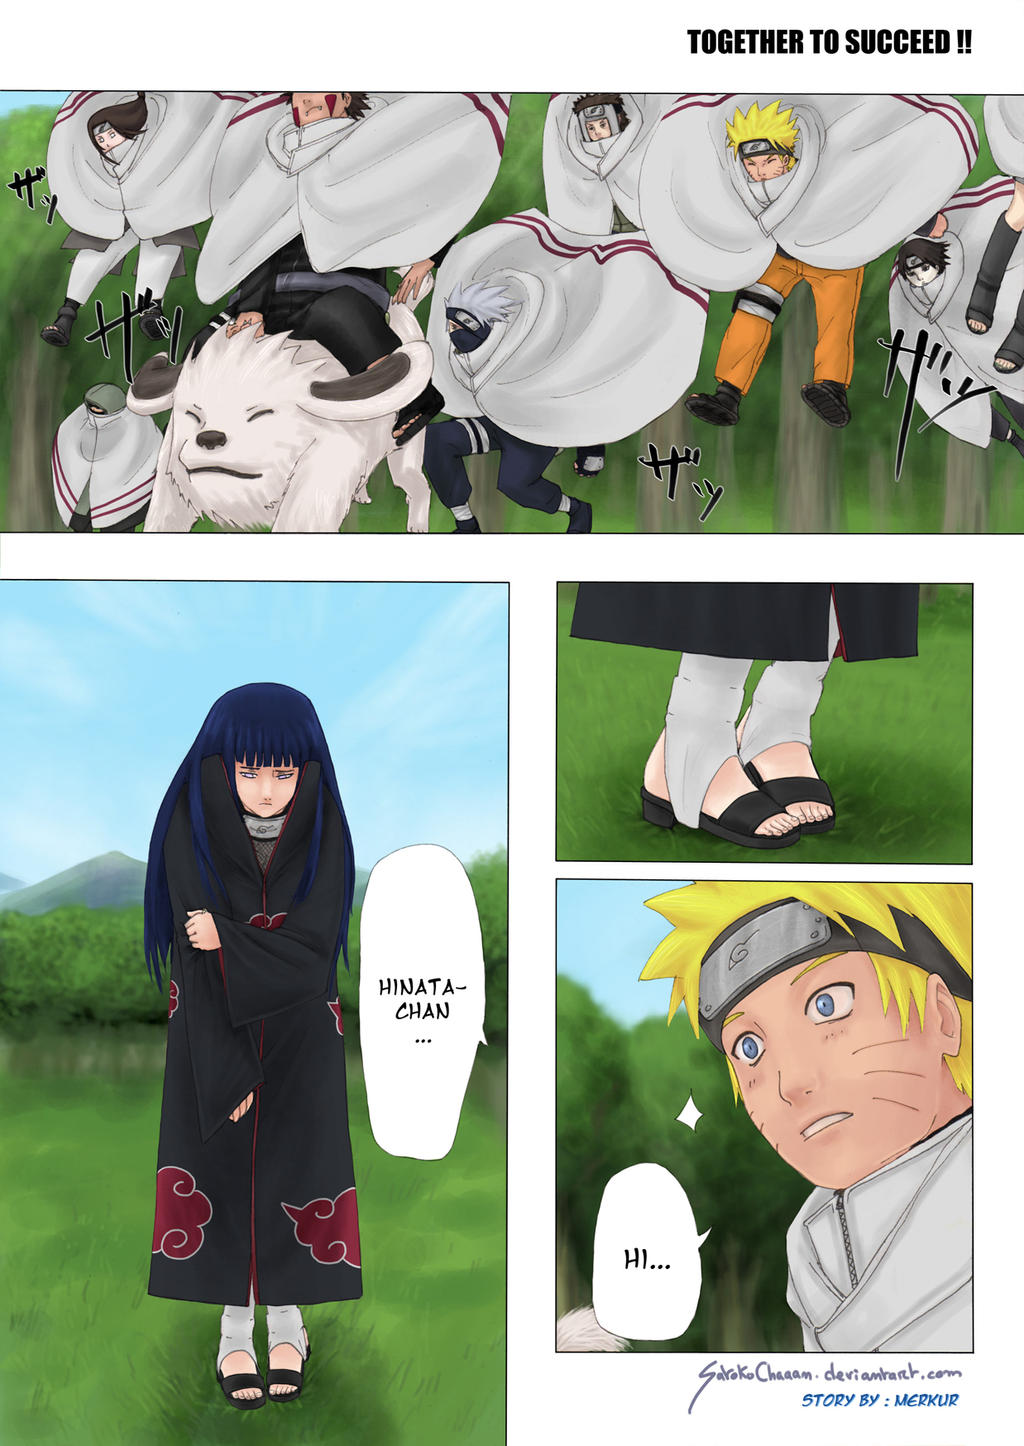 Naruto chat 1 sasuke returns fanfic